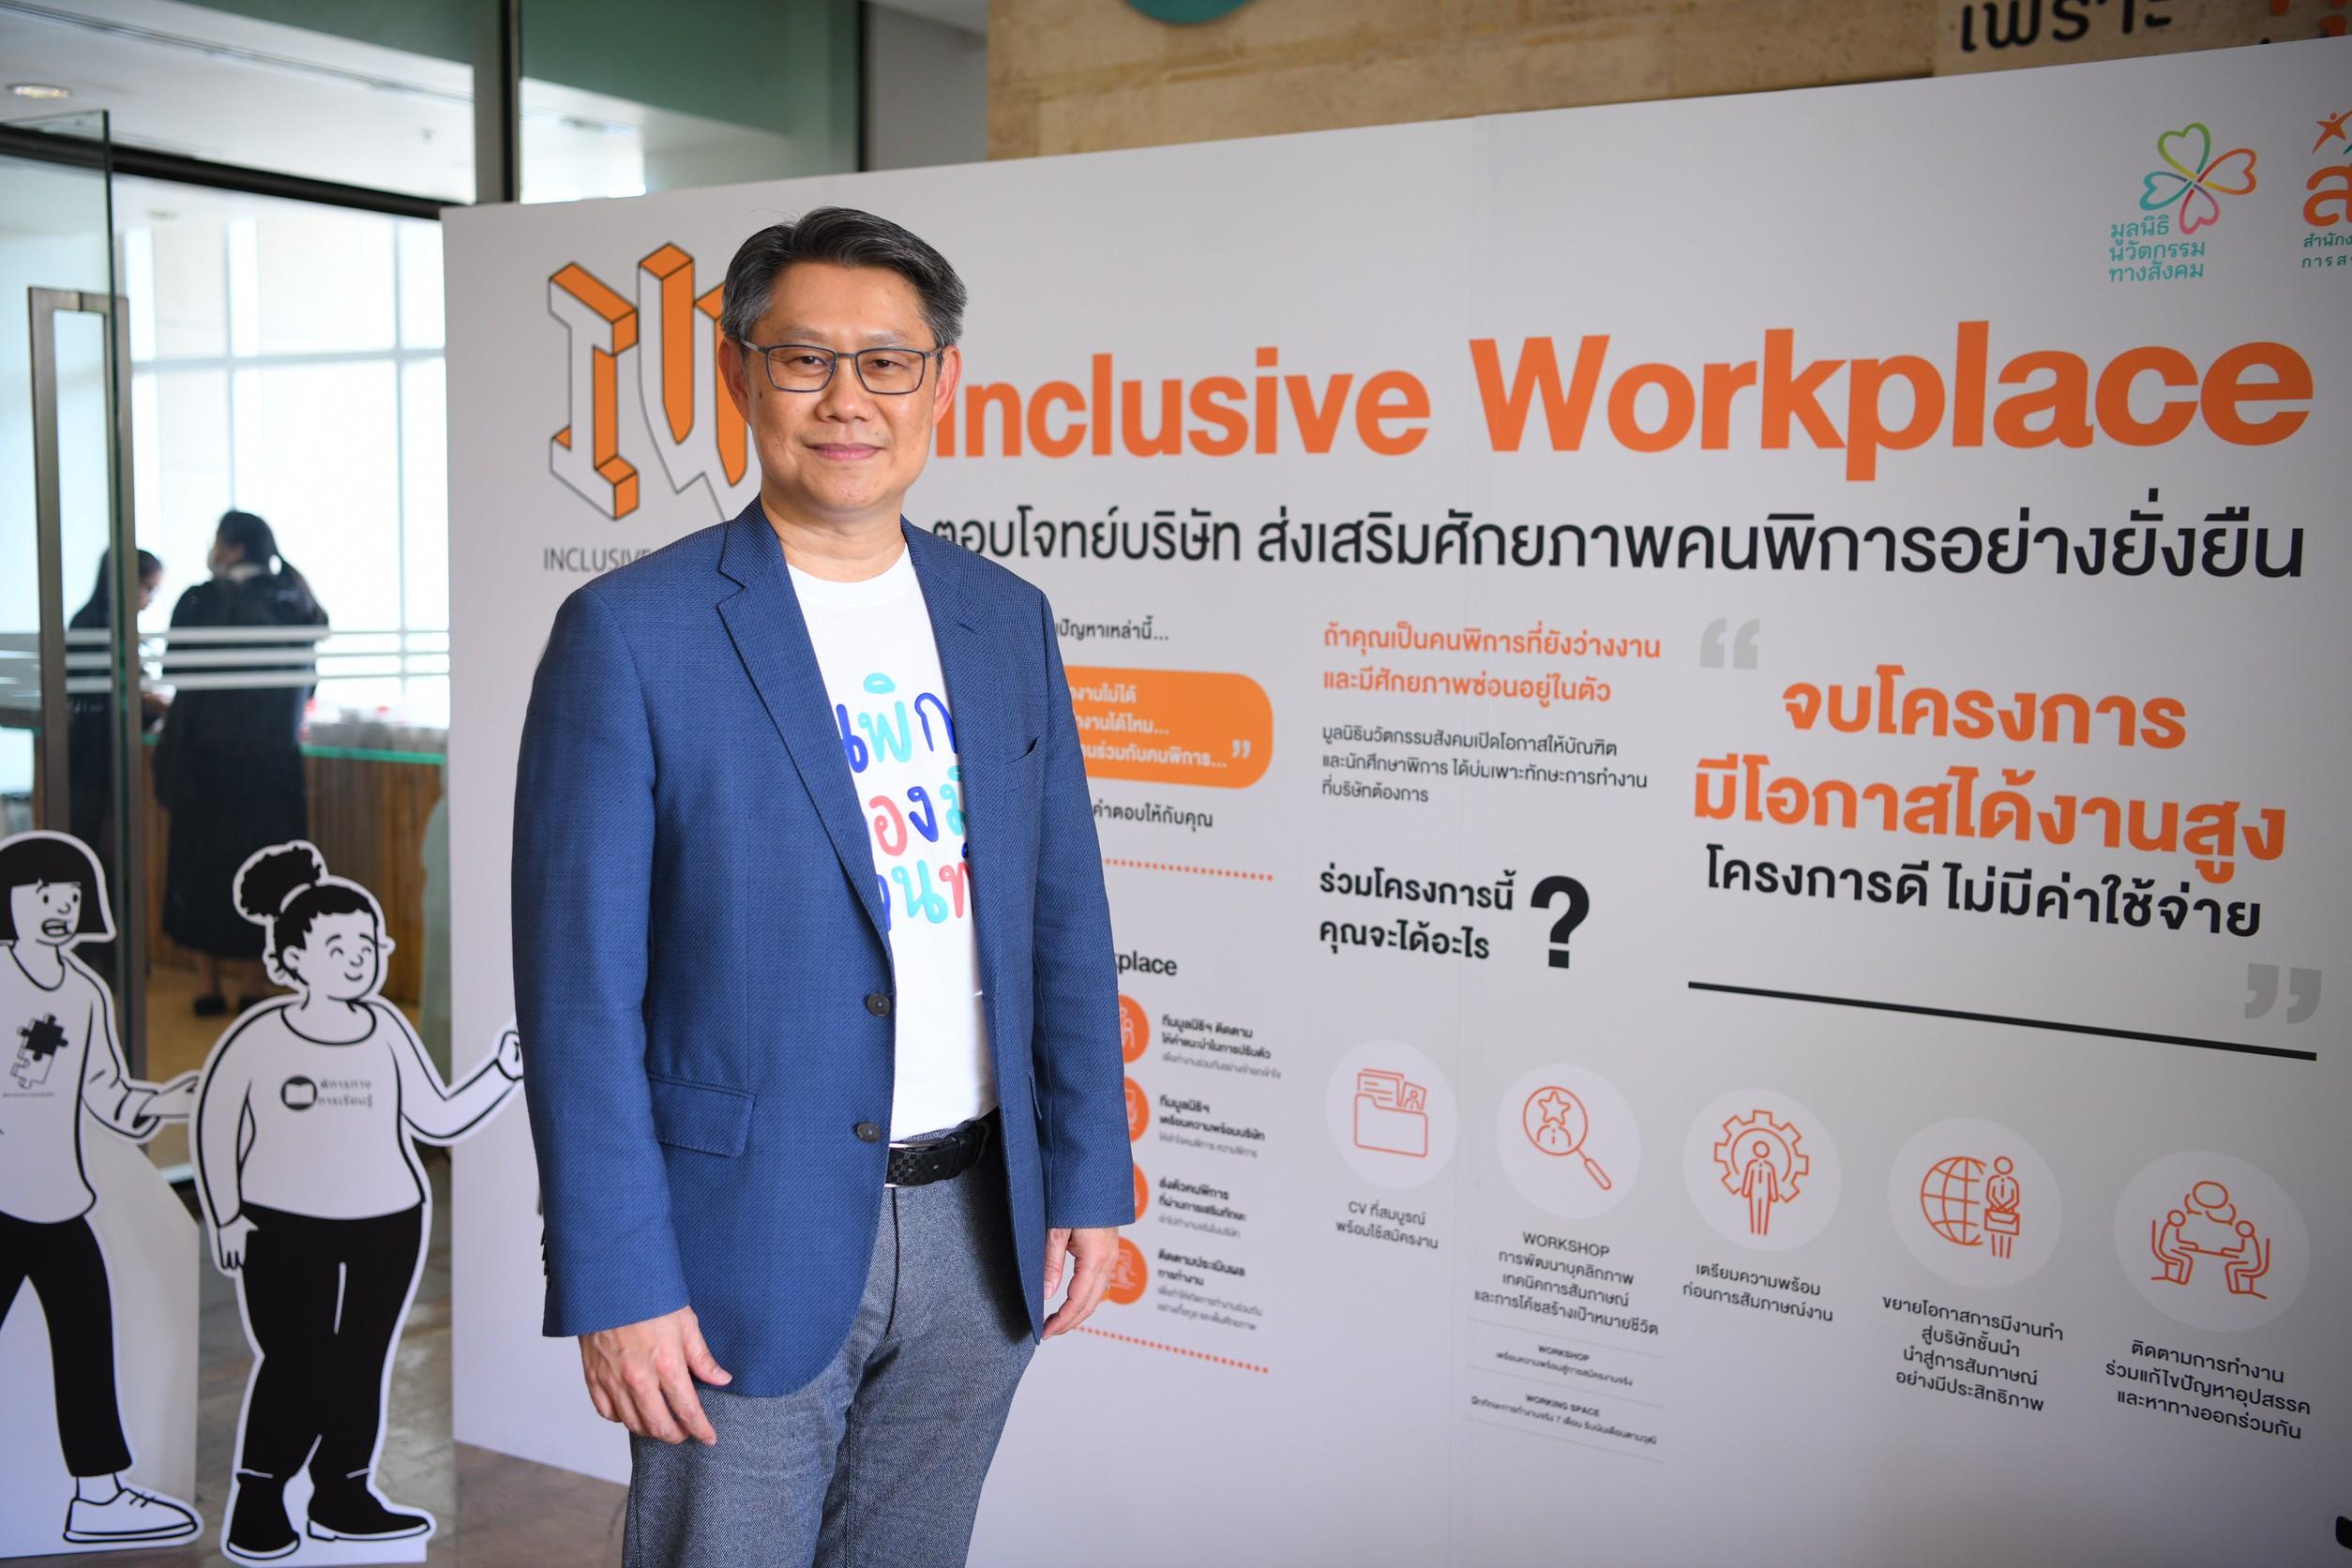 Inclusive Workplace ลดช่องว่าง สร้างโอกาส   thaihealth